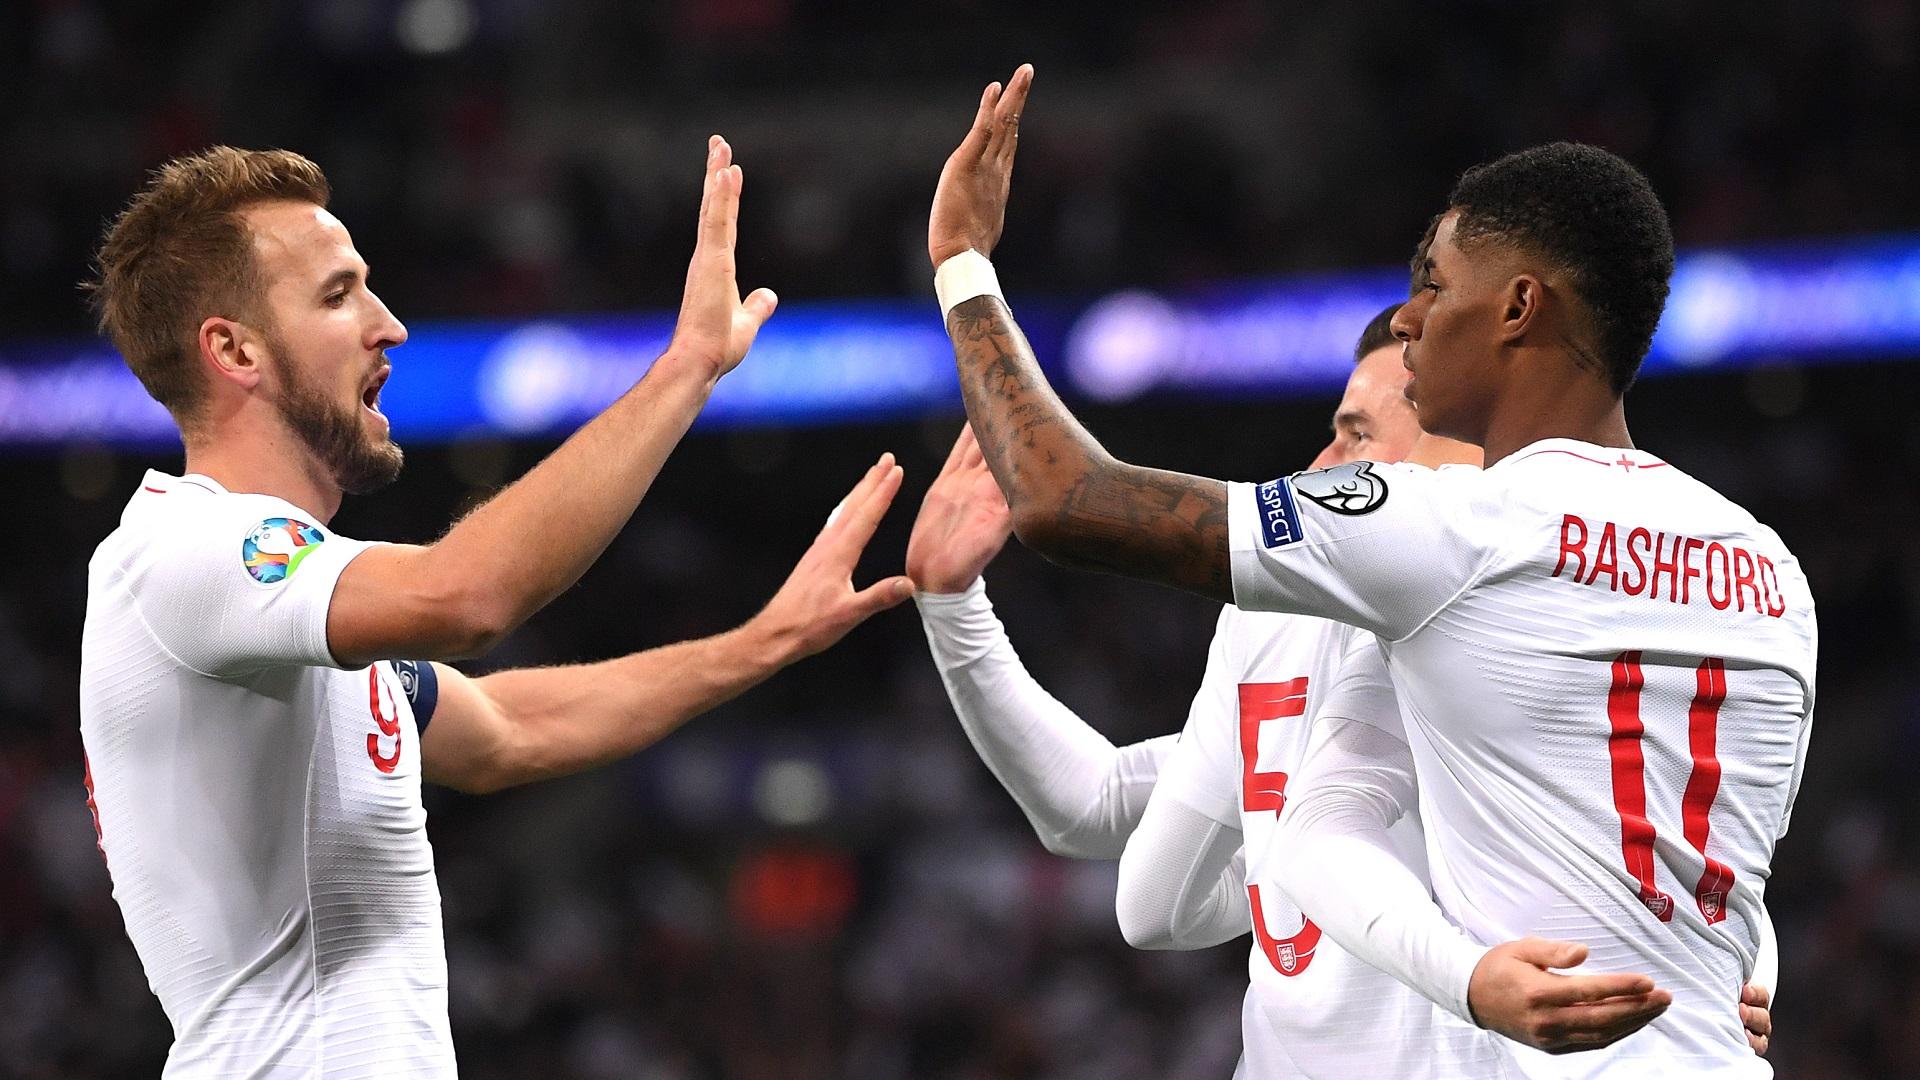 Harry Kane Marcus Rashford England 2019